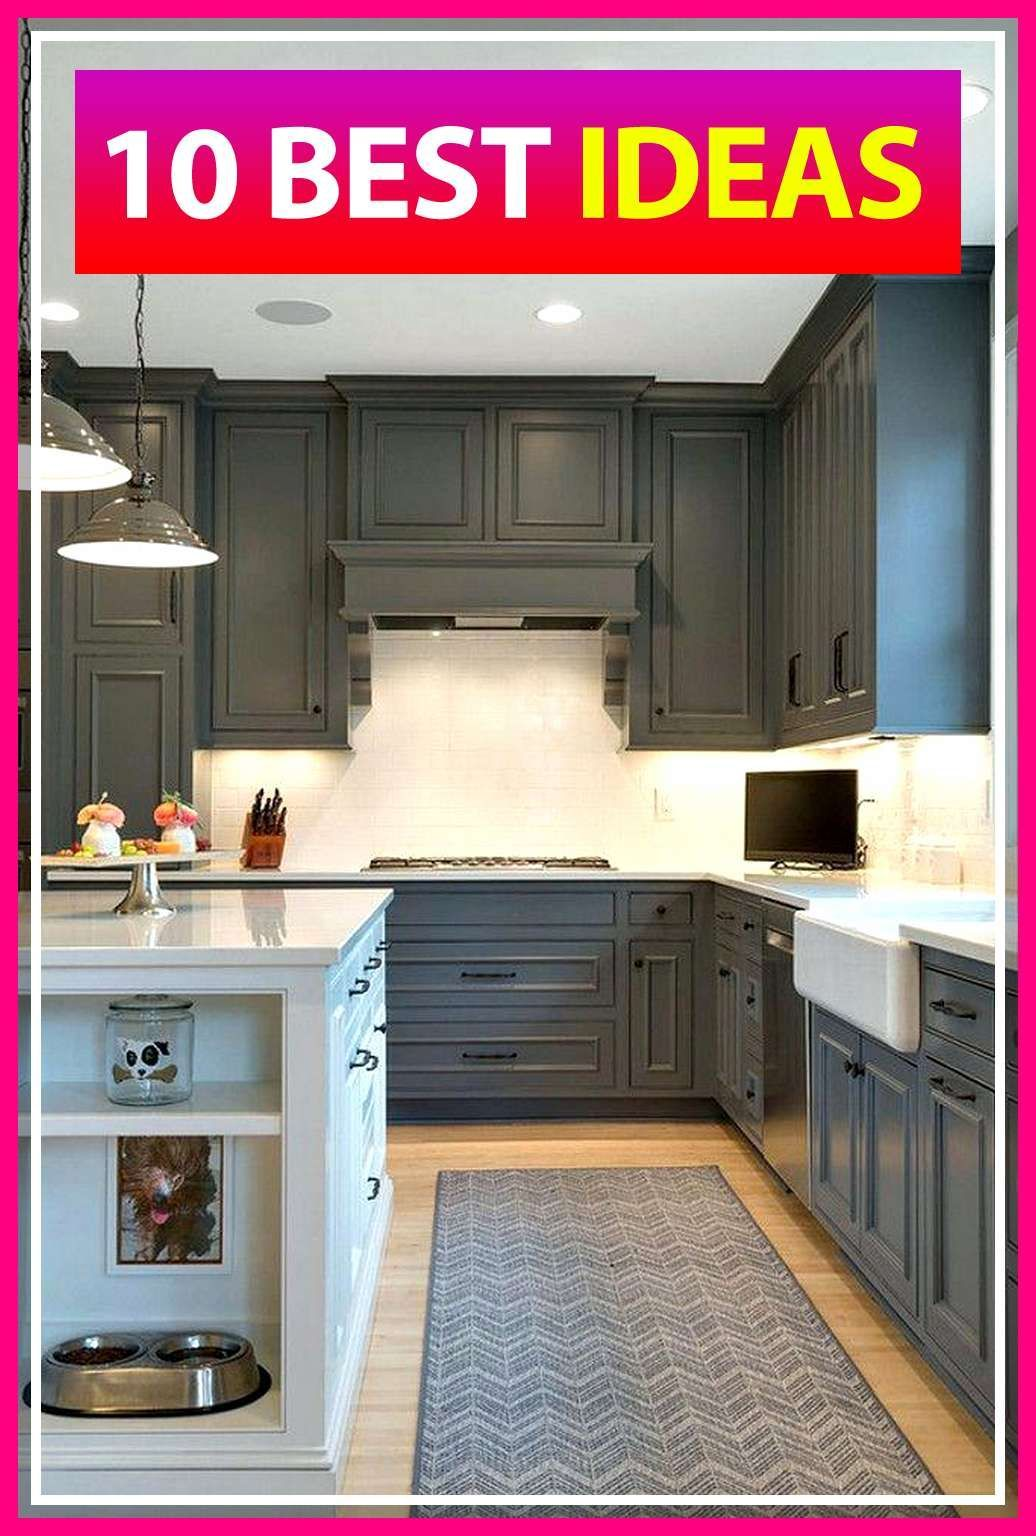 10 Amazing Best Black Kitchen Cabinet Paint Ideas Darkkitchencabinets This Is Painted Kitchen Cabinets Colors Black Kitchen Cabinets Painting Kitchen Cabinets